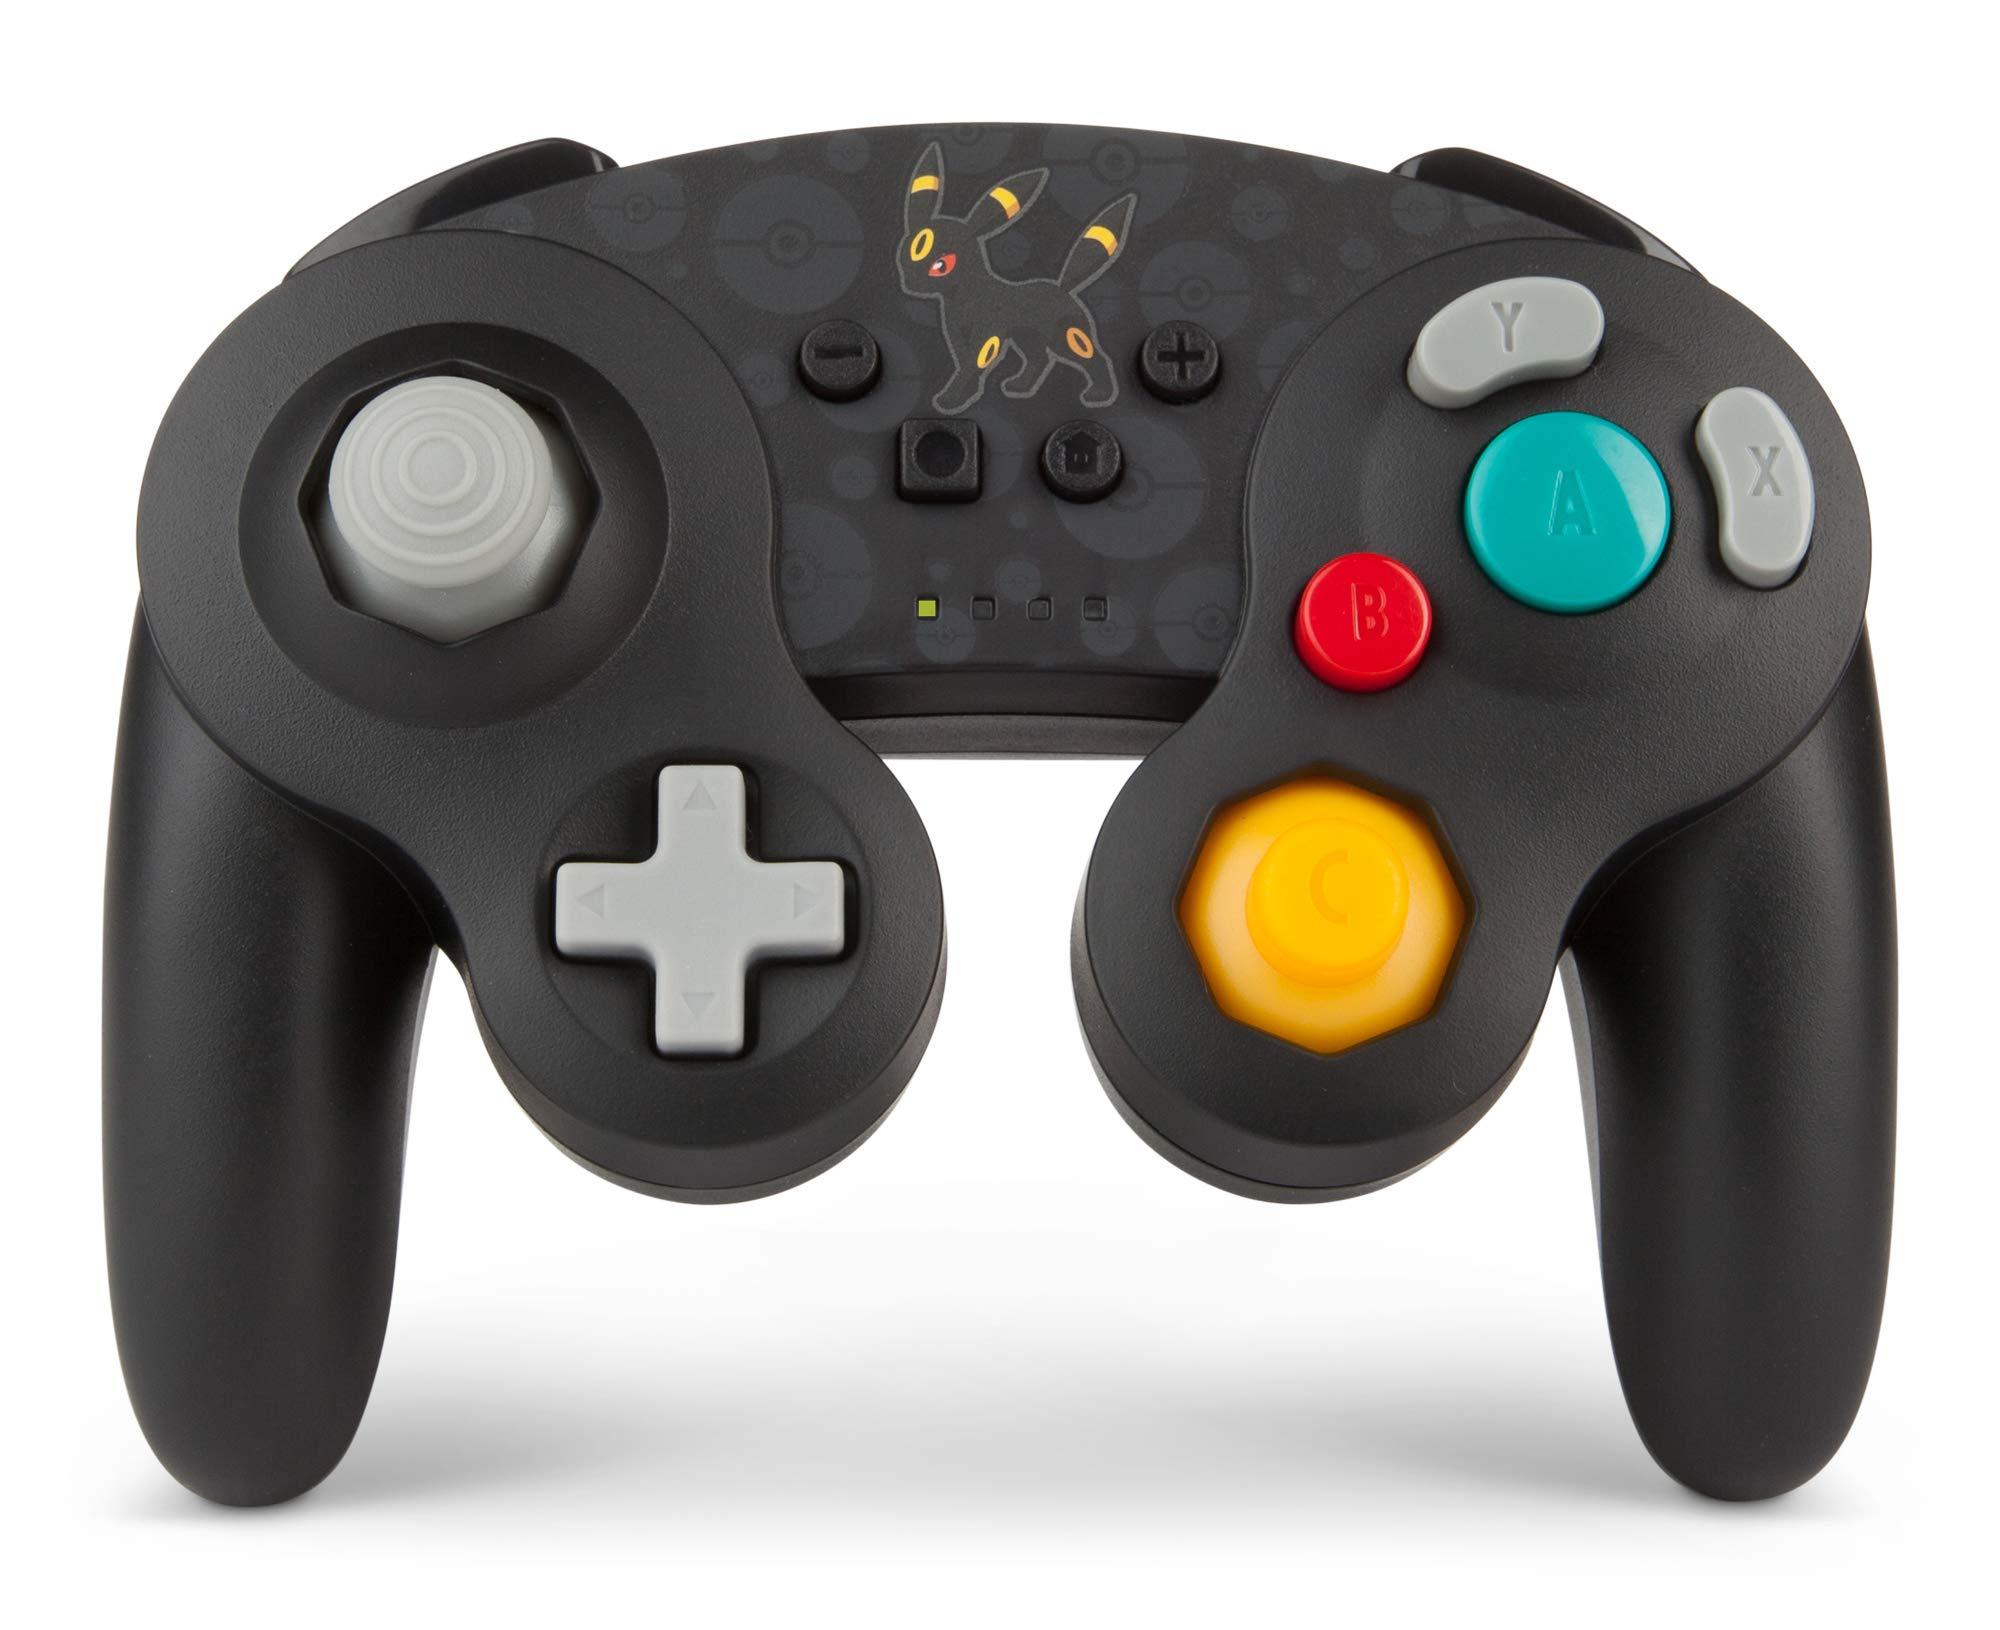 PowerA - Controlador inalámbrico mejorado (Nintendo Switch / GameCube, Espeon): Amazon.es: Videojuegos